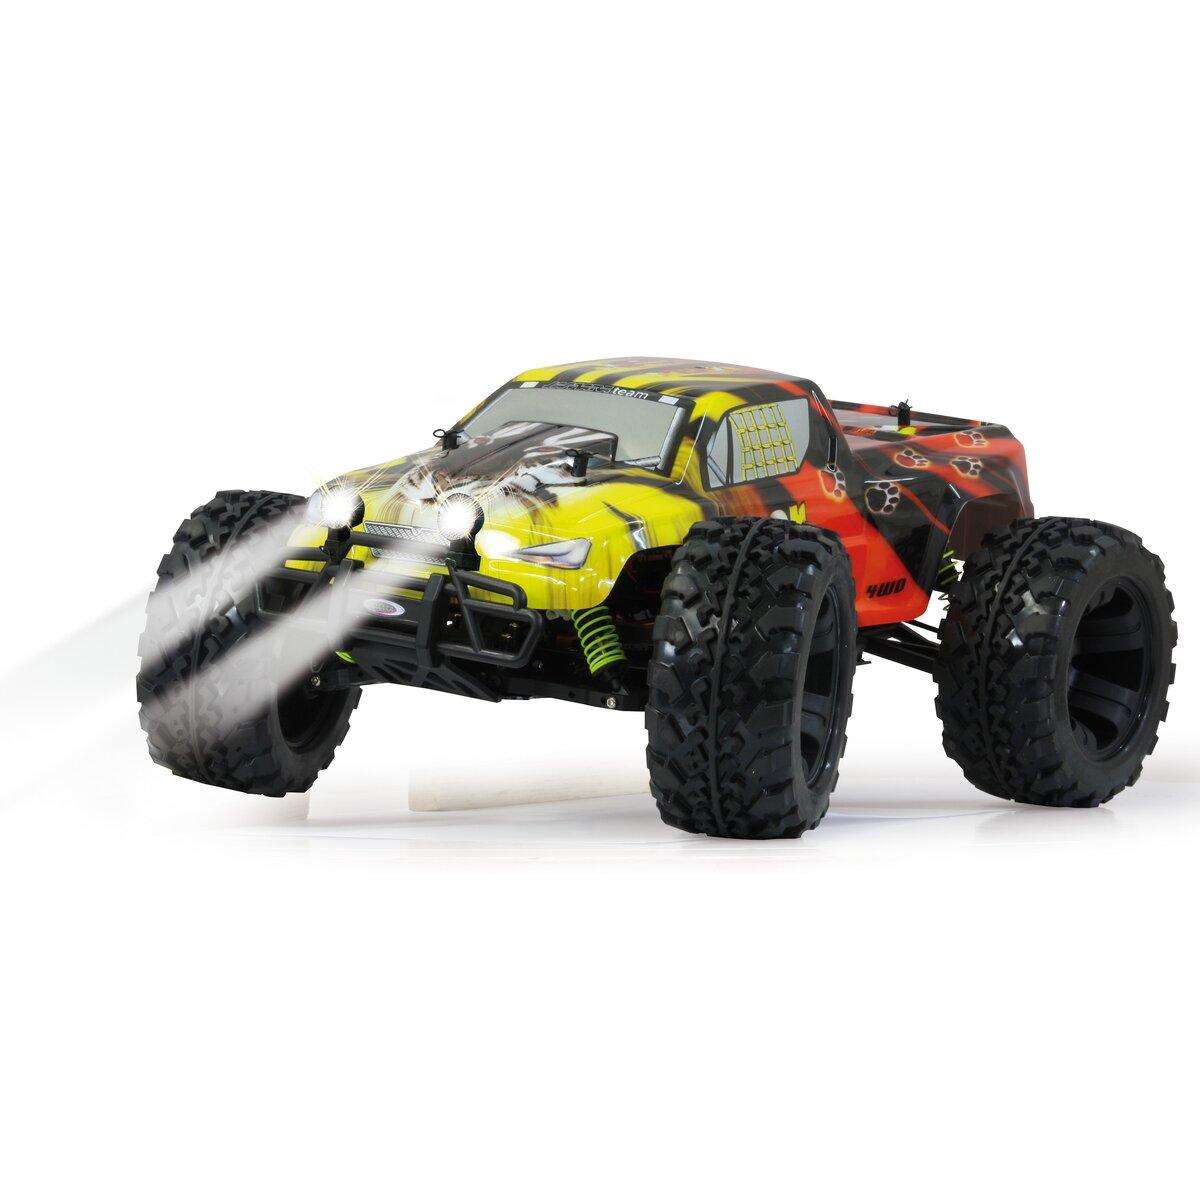 Jamara Tiger Monstertruck 1:10 4WD NiMh 2,4G LED